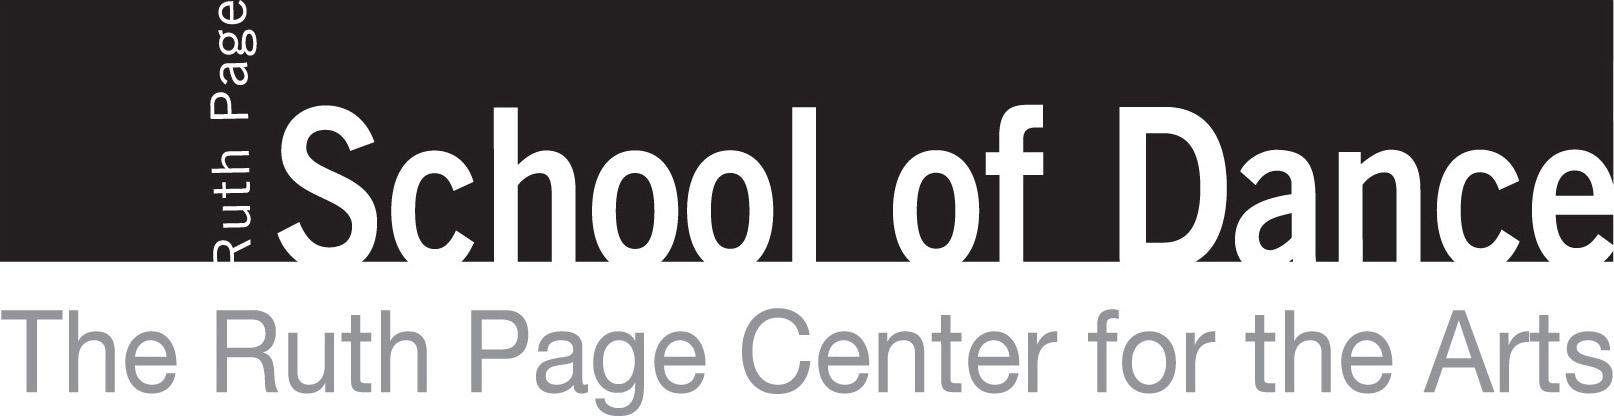 RP School logo BLACK.jpg